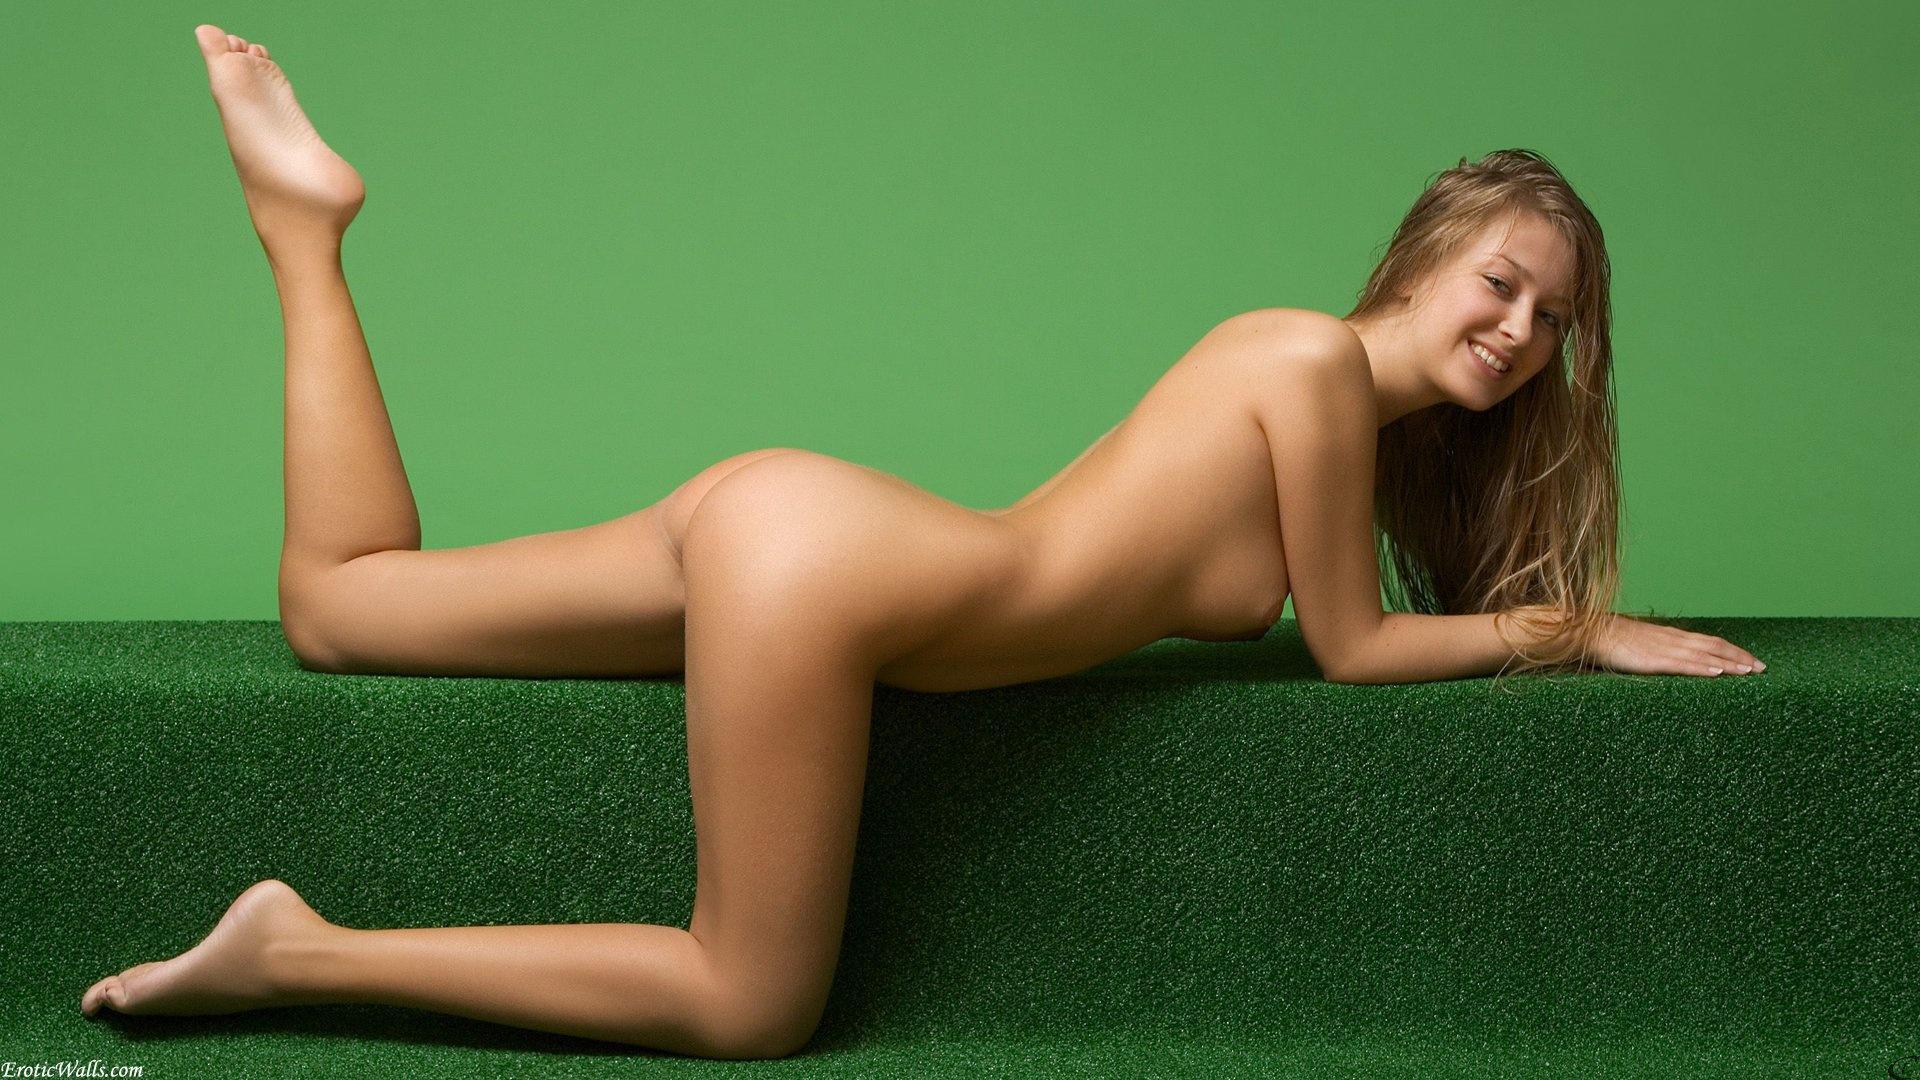 Download photo 1920x1080, smile, kinga, nude, ass, tits